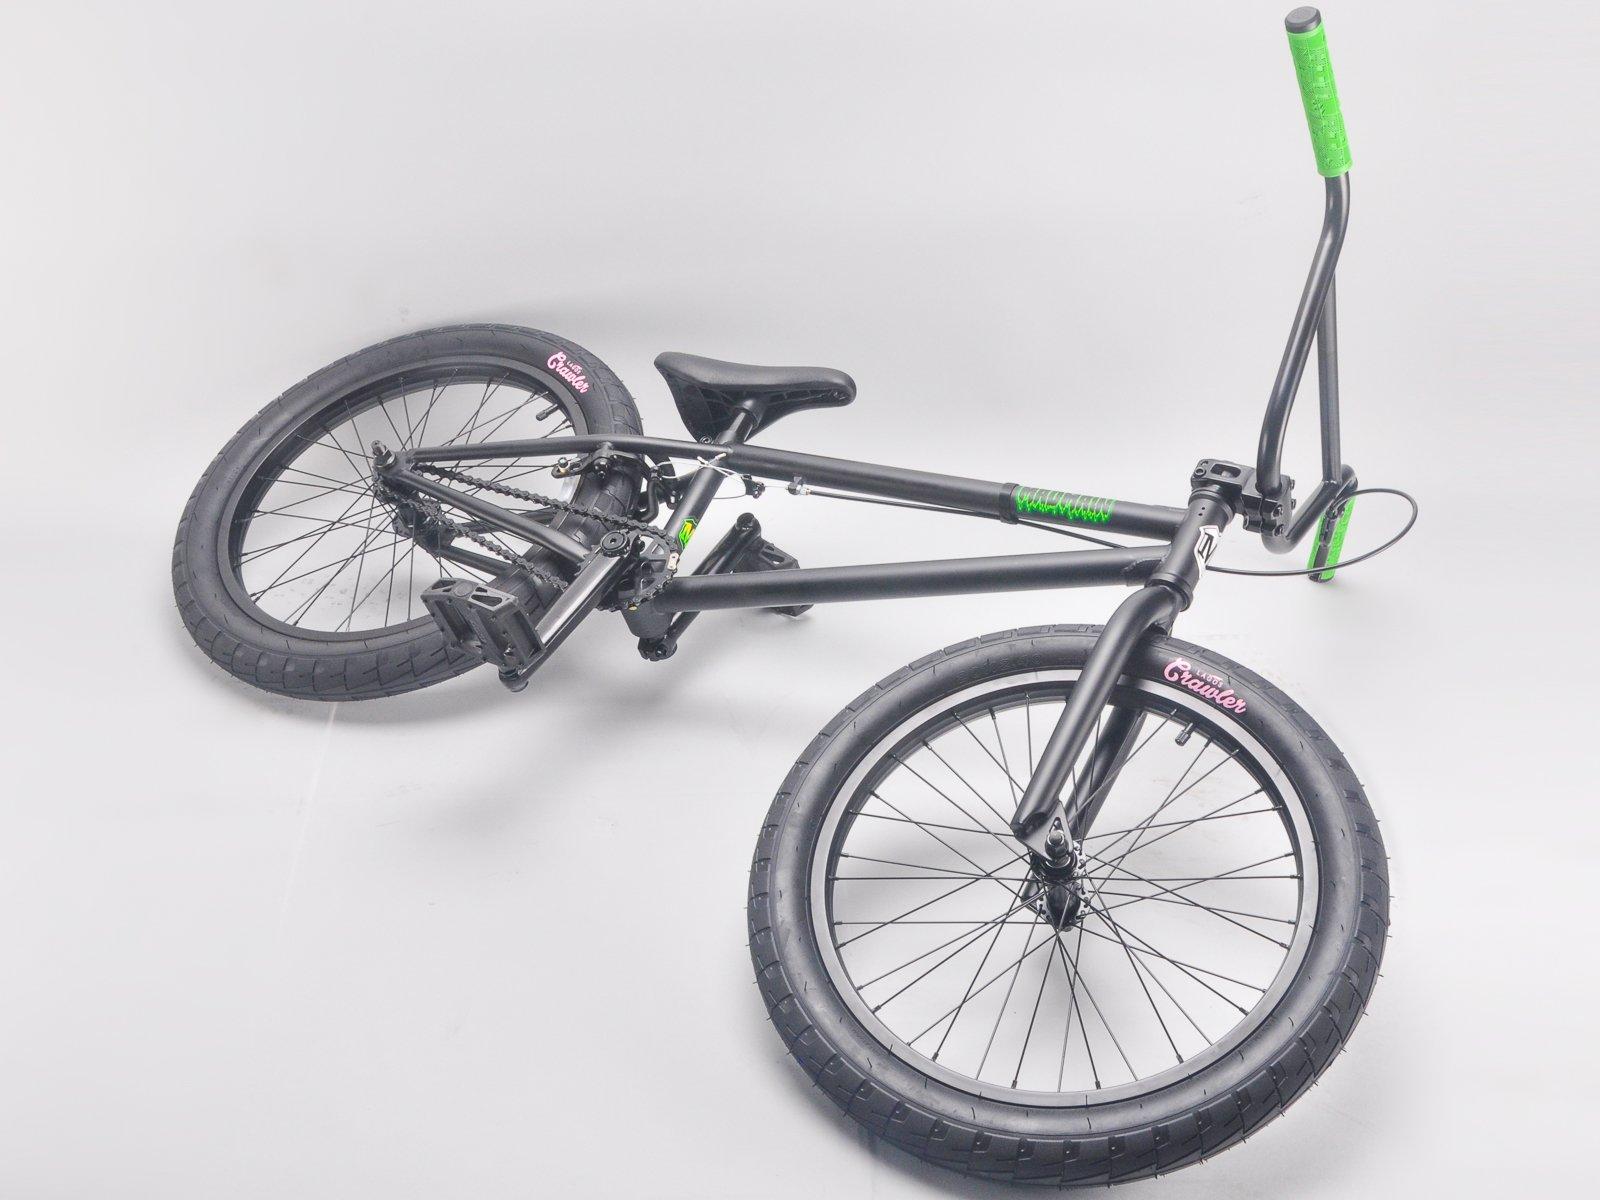 Mafiabikes Madmain 20 Flat Black Harry Main BMX Bike